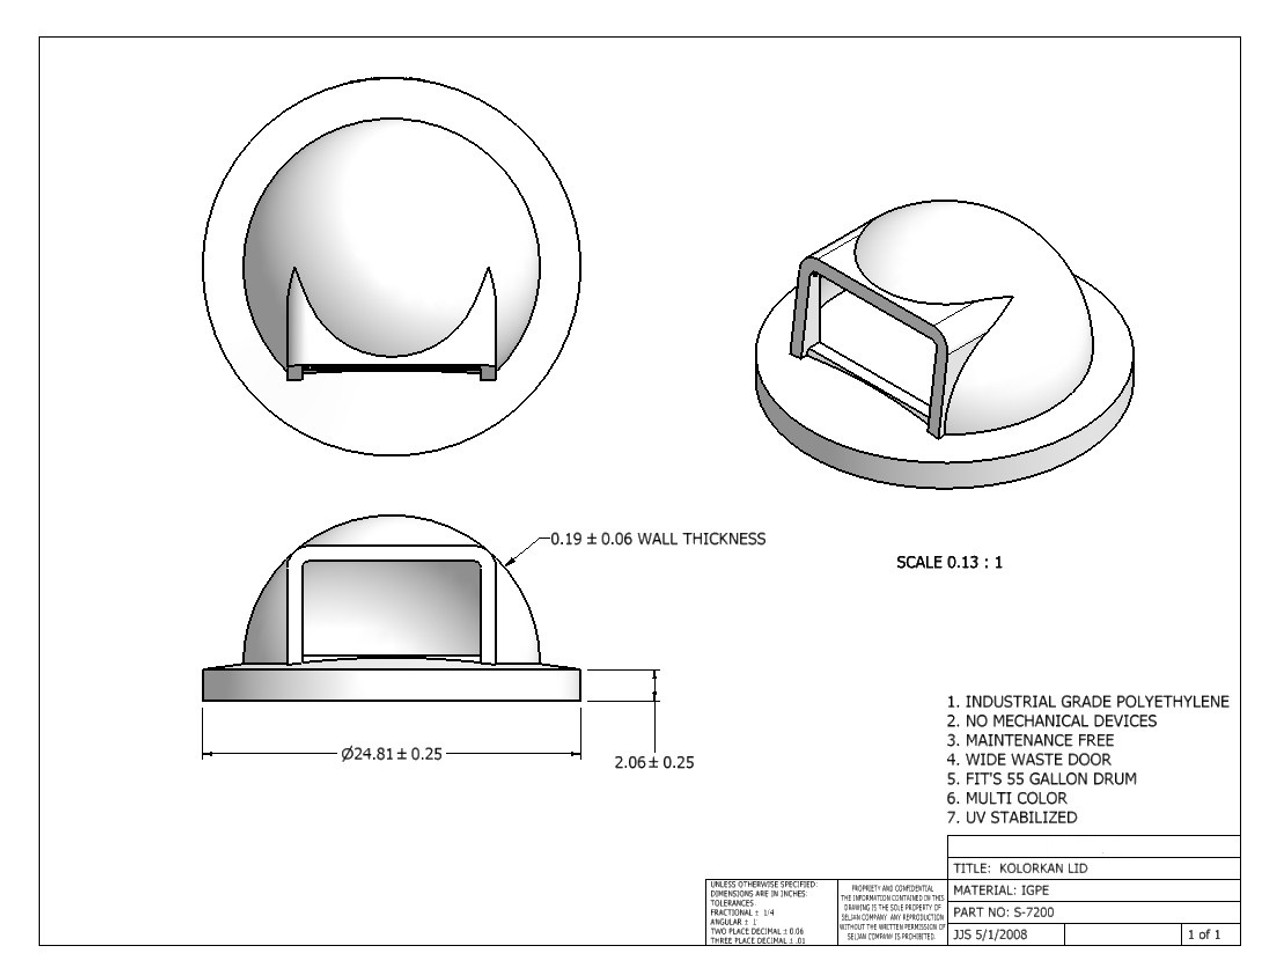 Dome Lid Spec Sheet